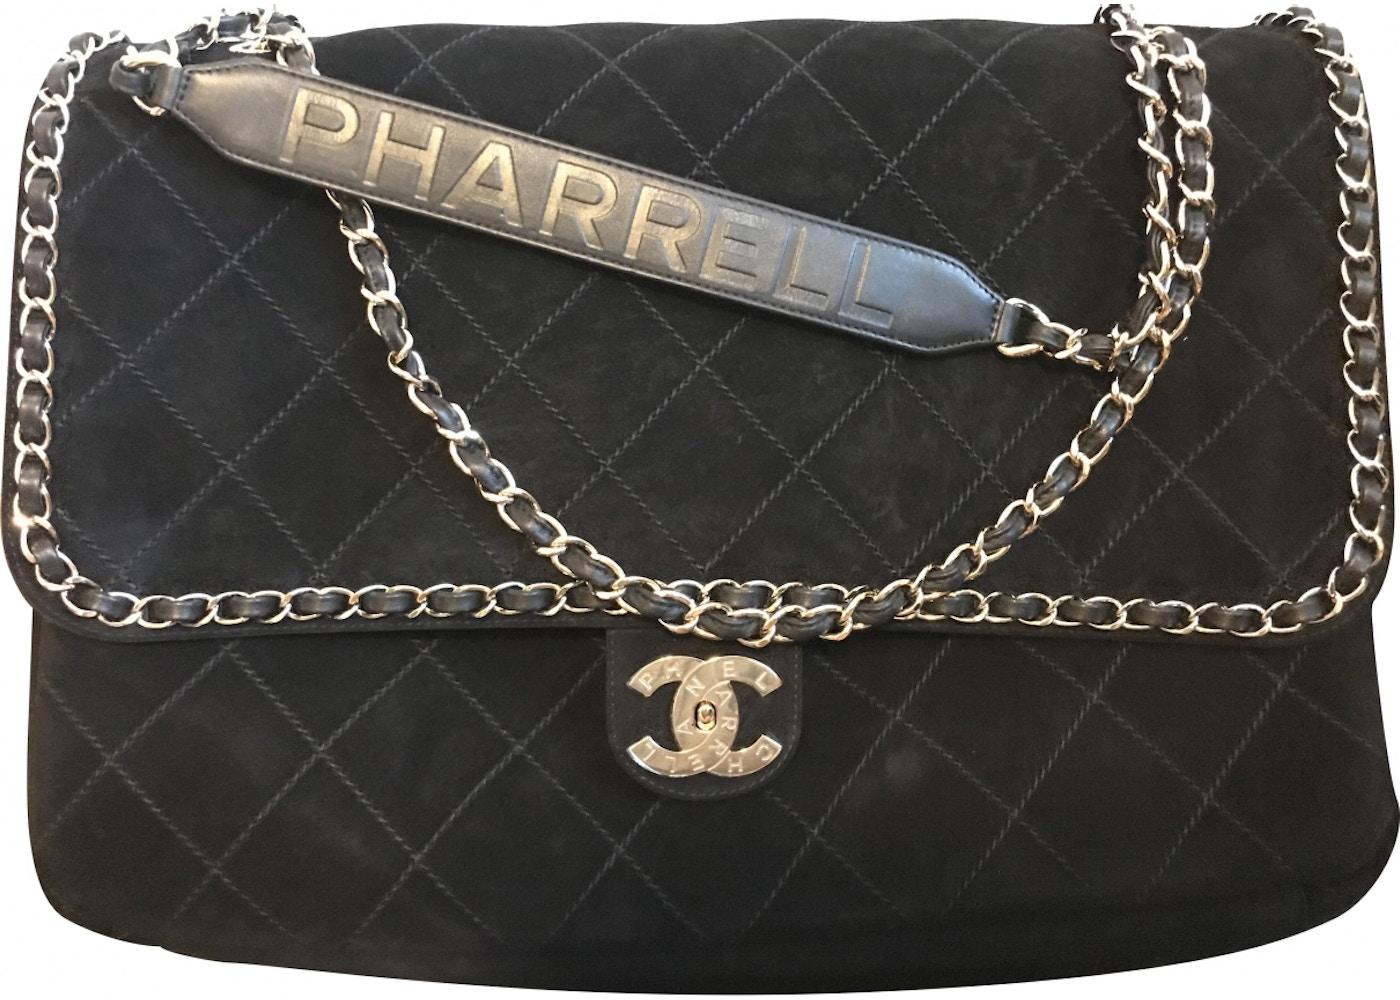 463c6d2a606a15 Chanel x Pharrell Flap Bag XXL Black. XXL Black